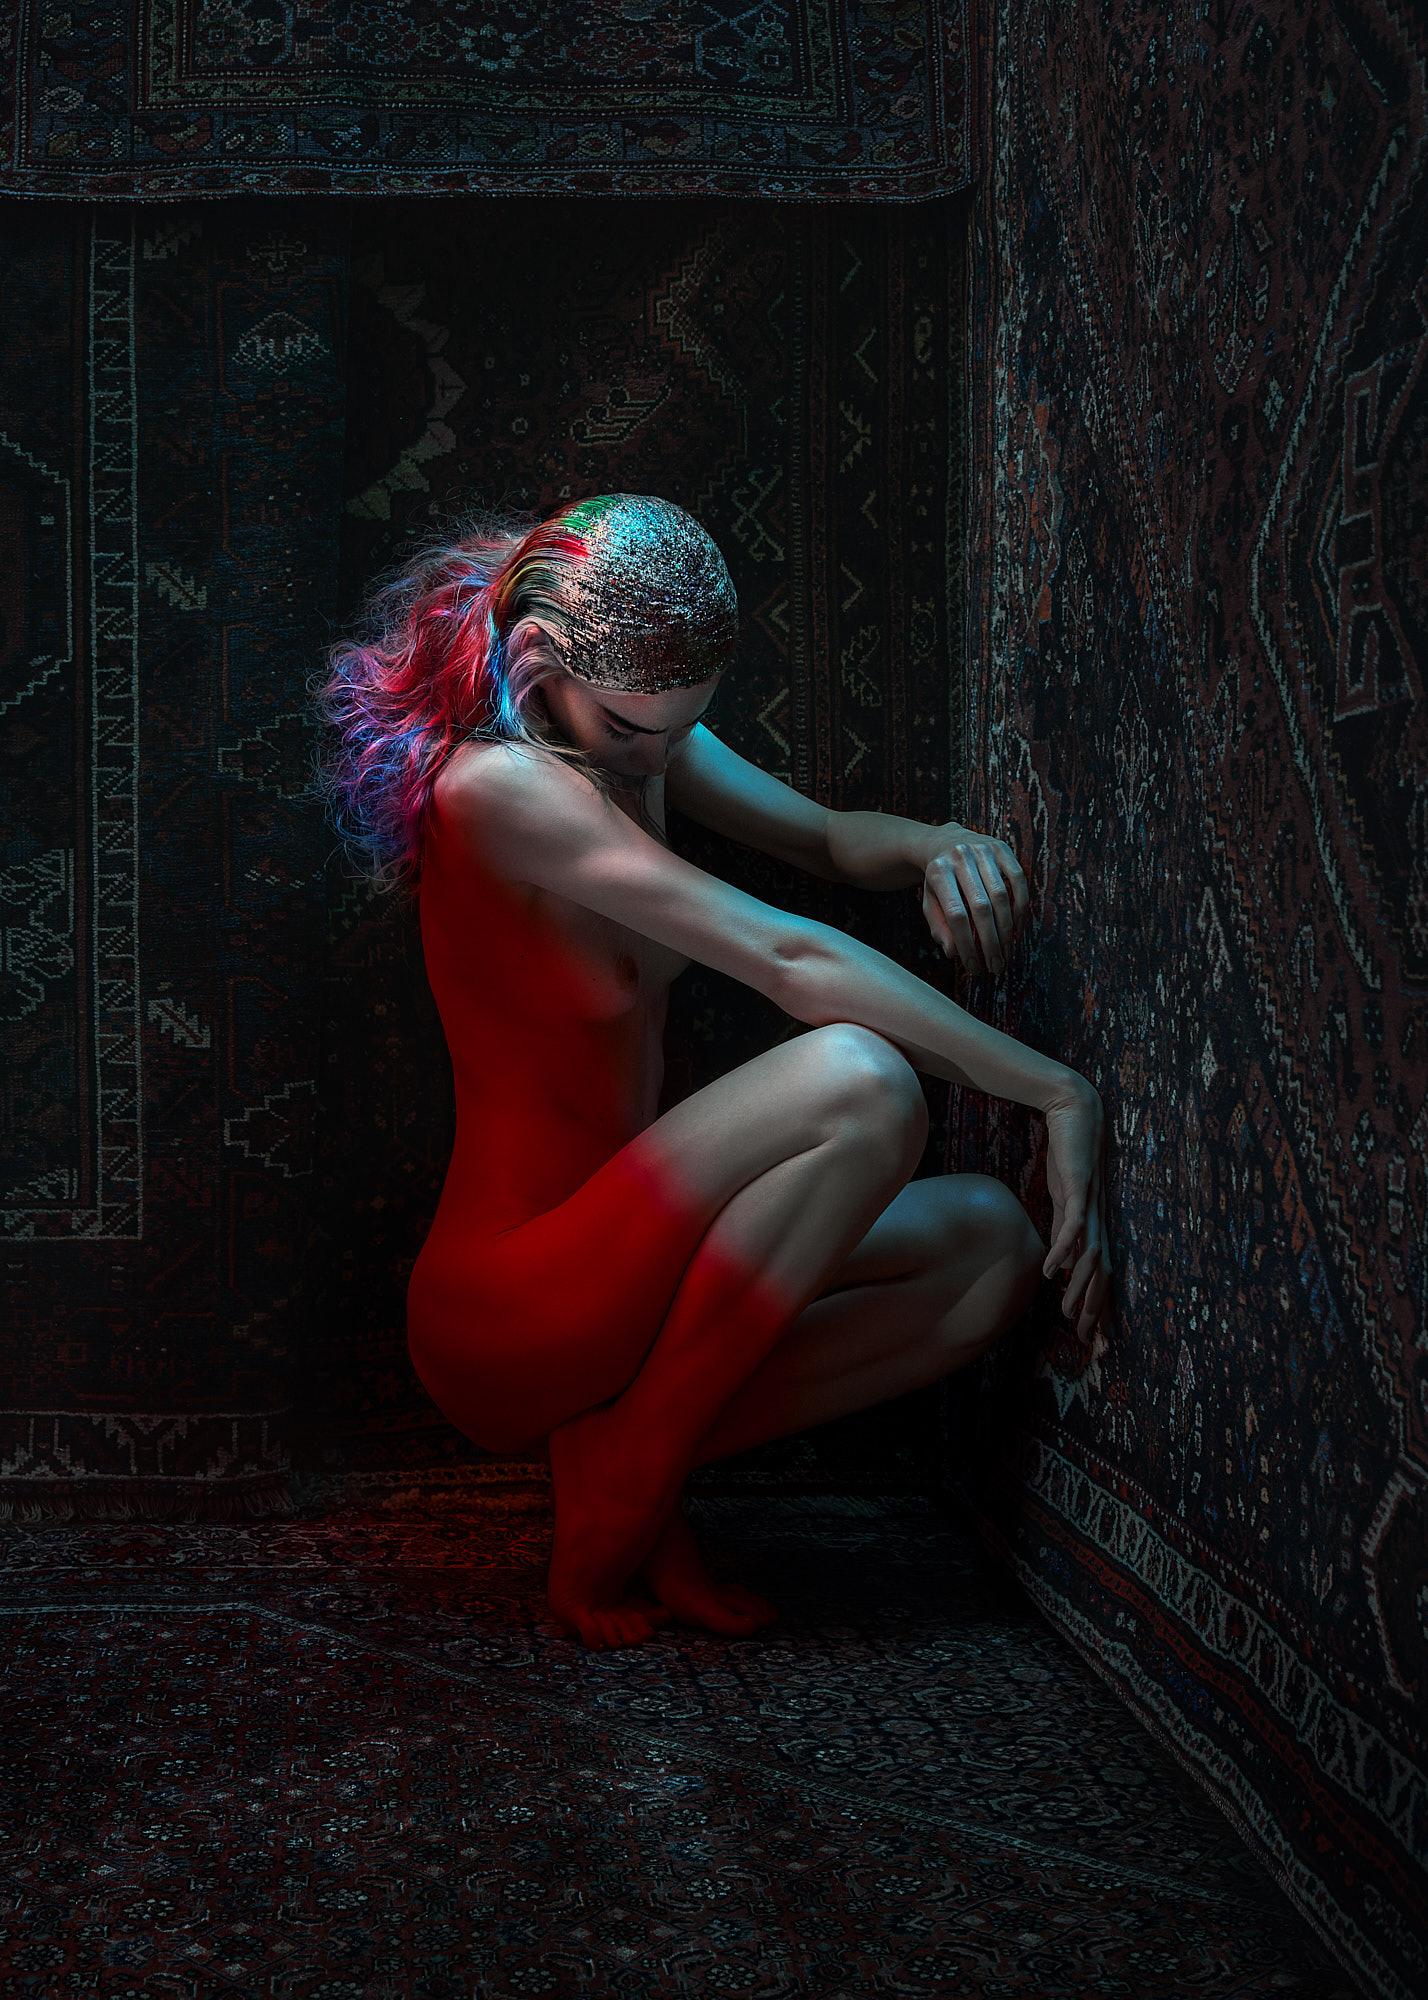 ATWINS_Red_Light_Glitter_0002